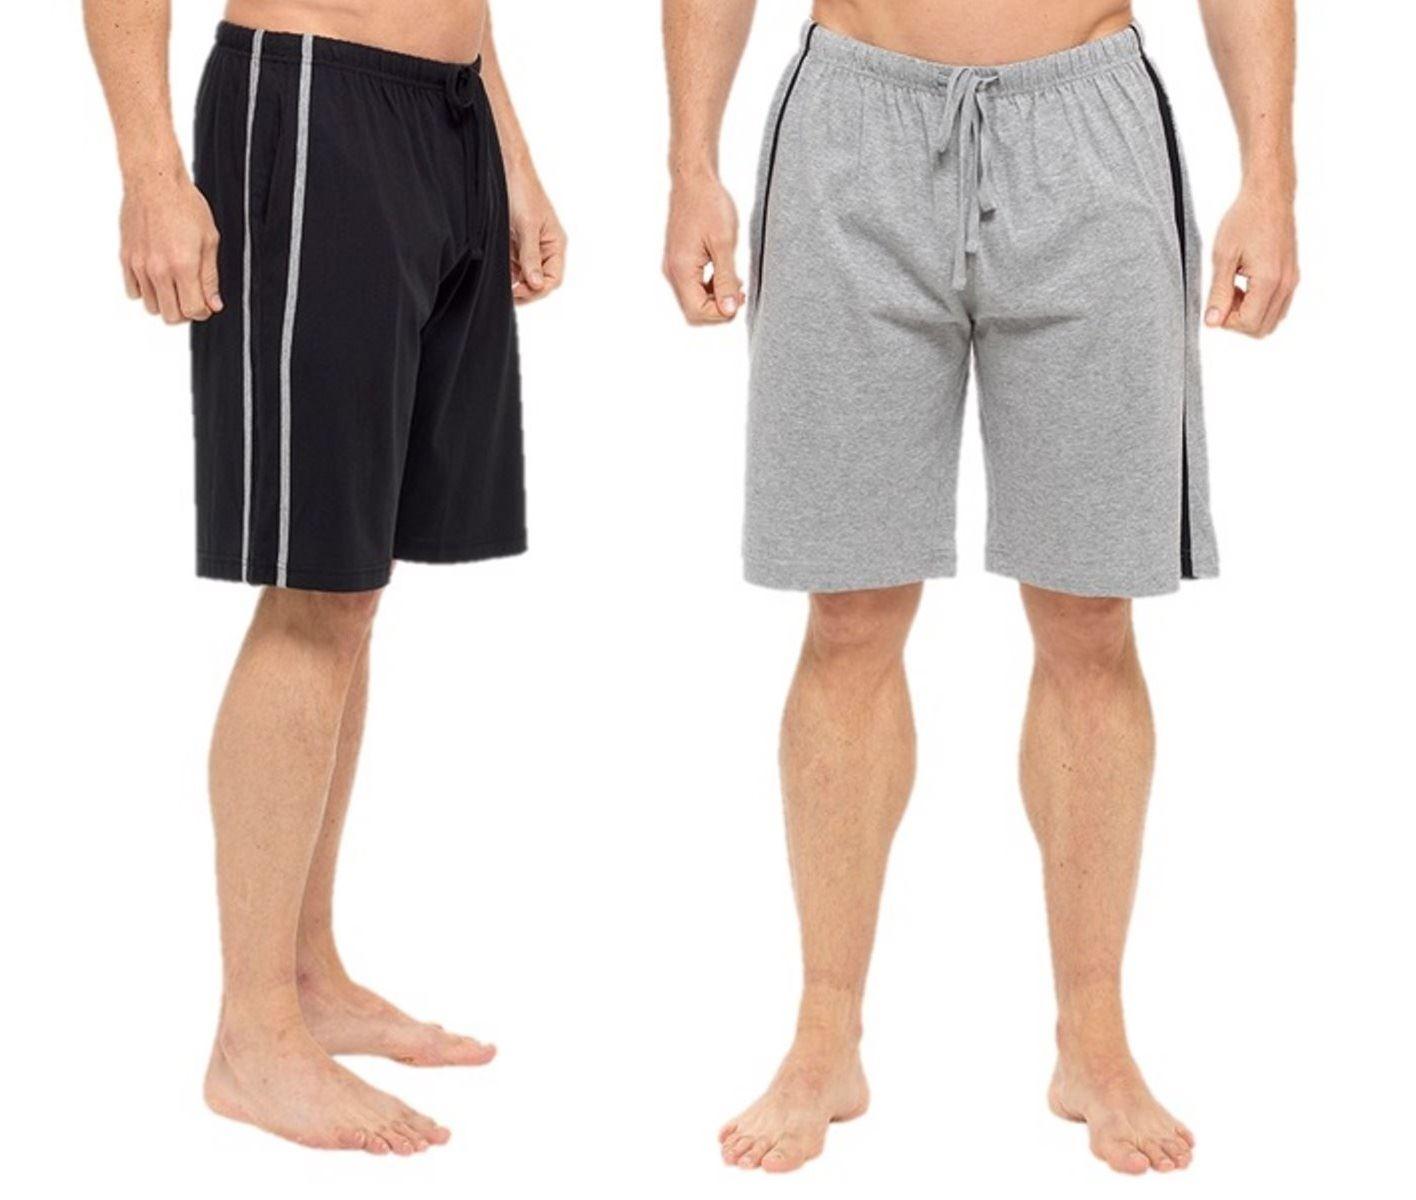 Da Uomo Lounge Pantaloni corti jersey cotone Lounge Wear Pigiama Pantaloncini